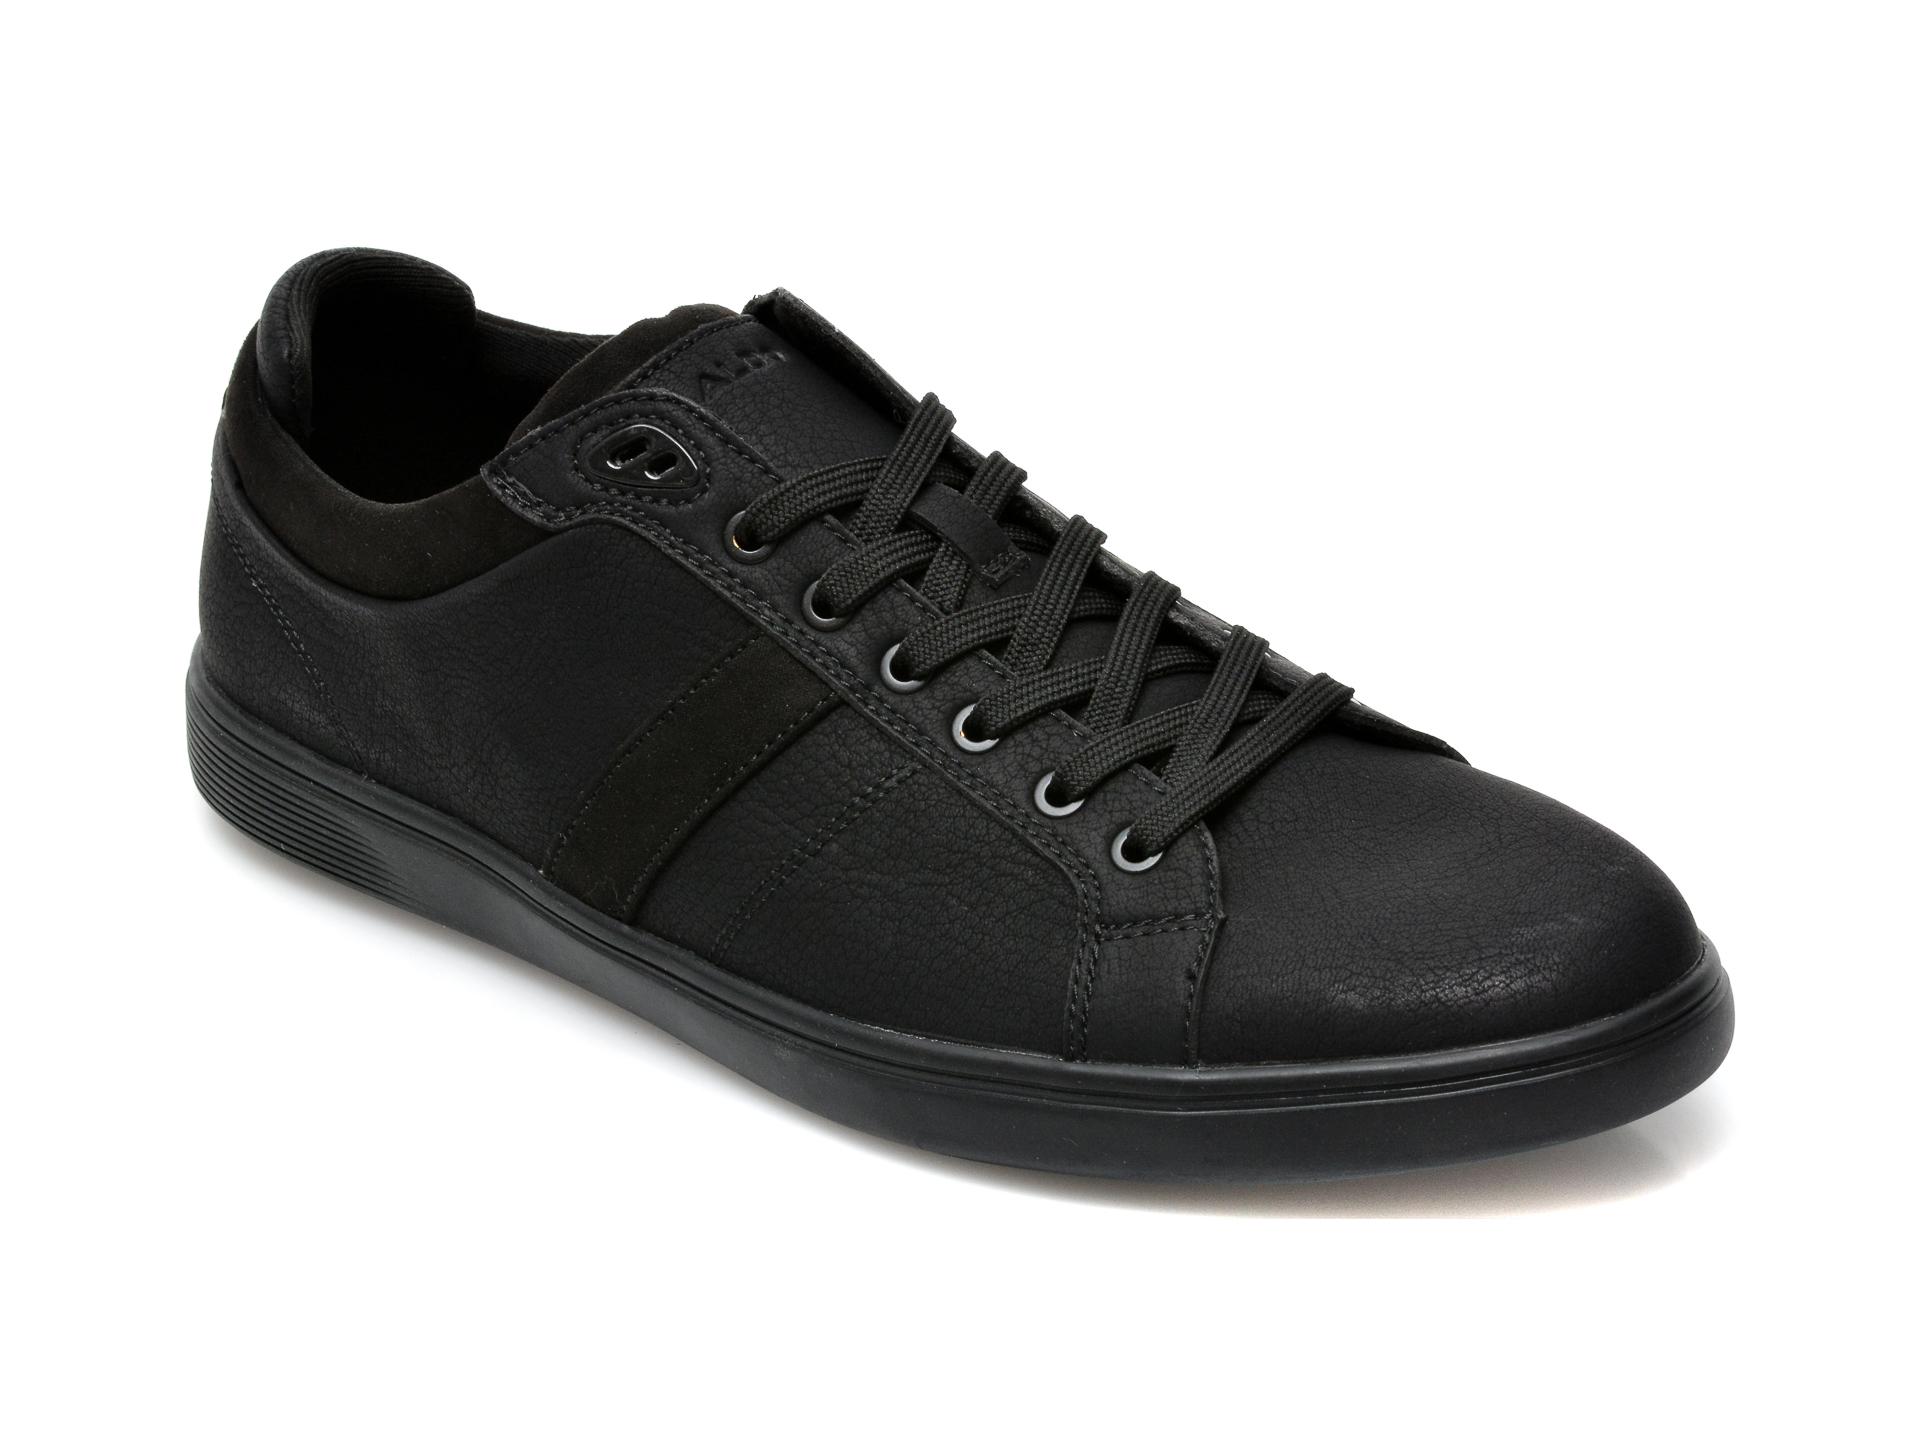 Pantofi ALDO negri, Koisen001, din piele ecologica imagine otter.ro 2021